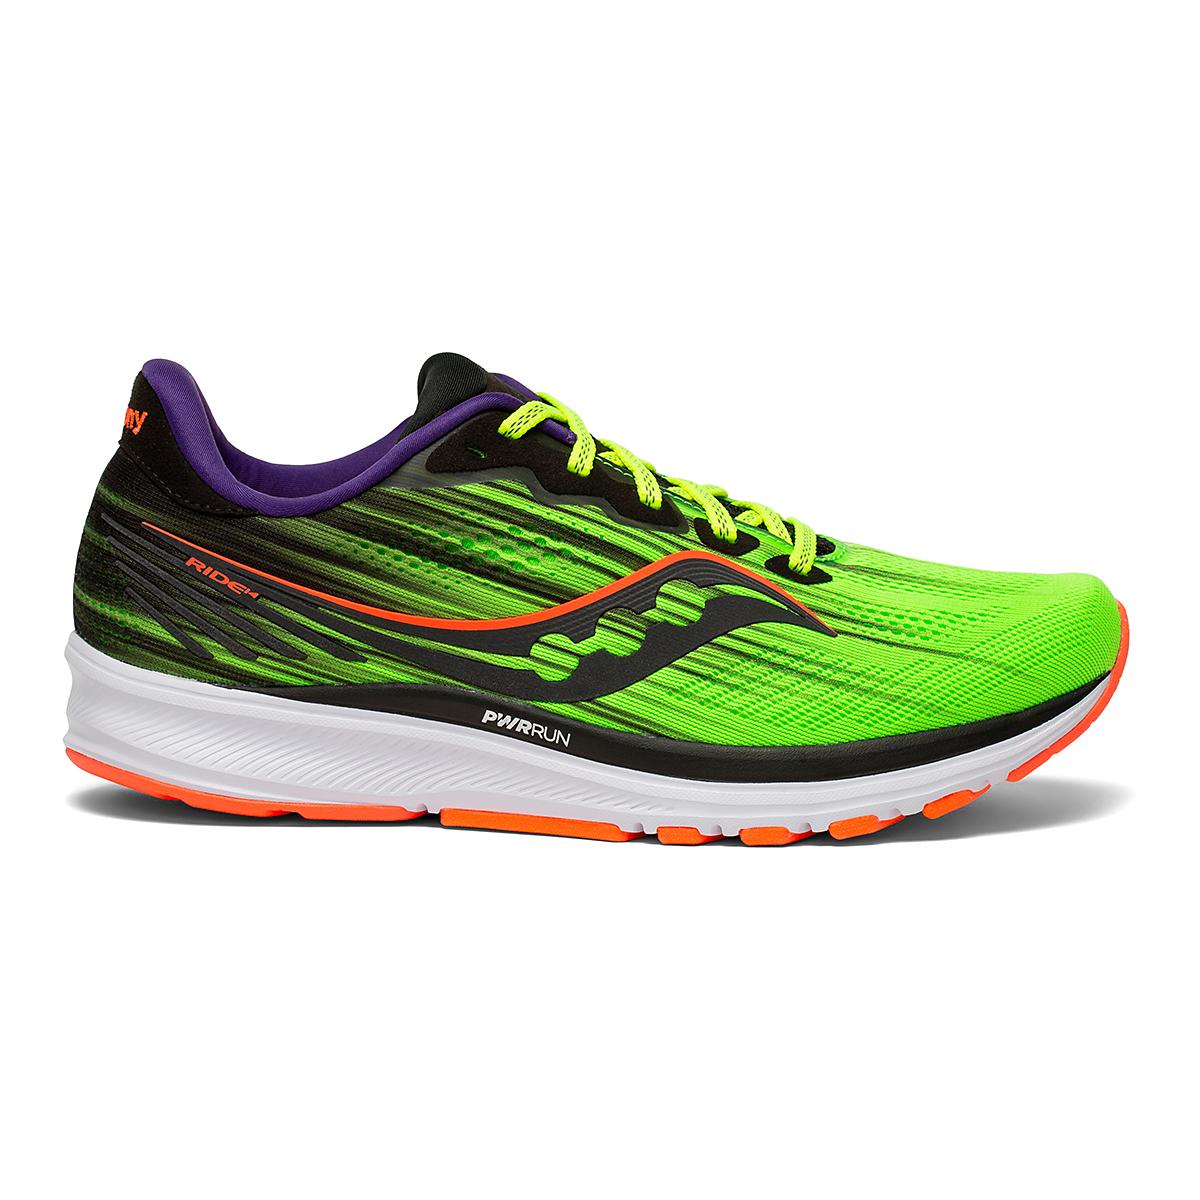 Men's Saucony Ride 14 Running Shoe - Color: Vizipro - Size: 7 - Width: Regular, Vizipro, large, image 1